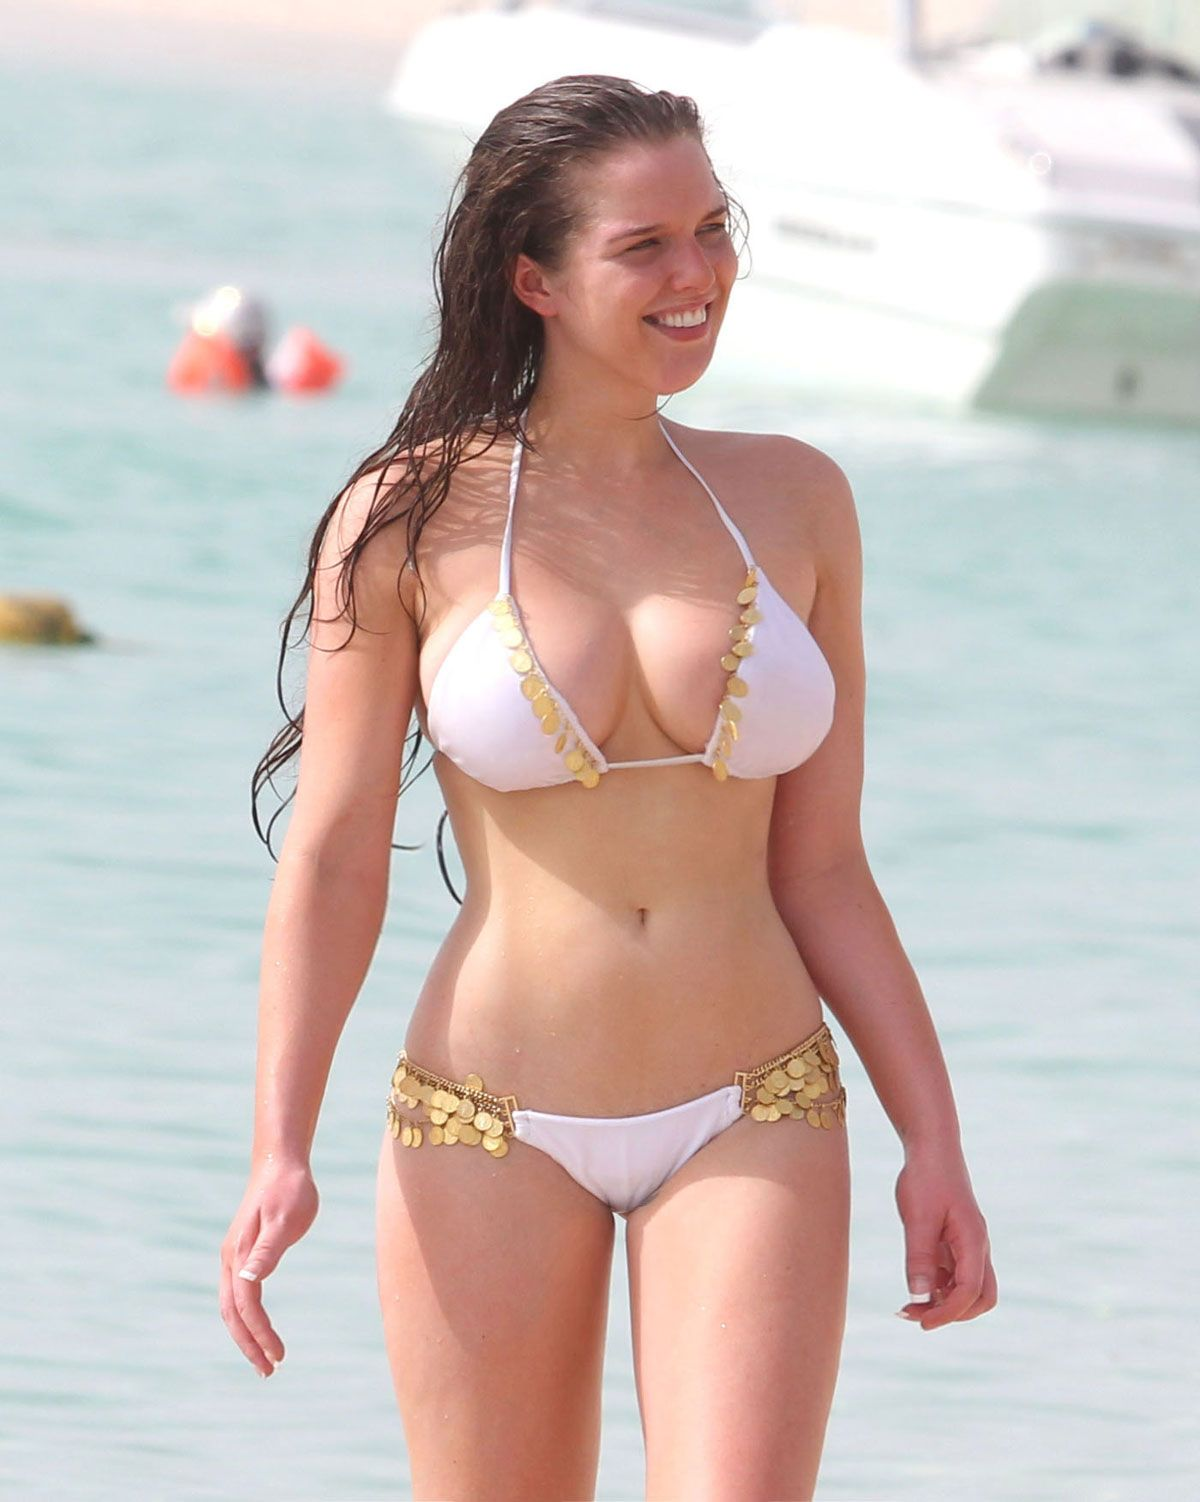 Jessica weaver topless